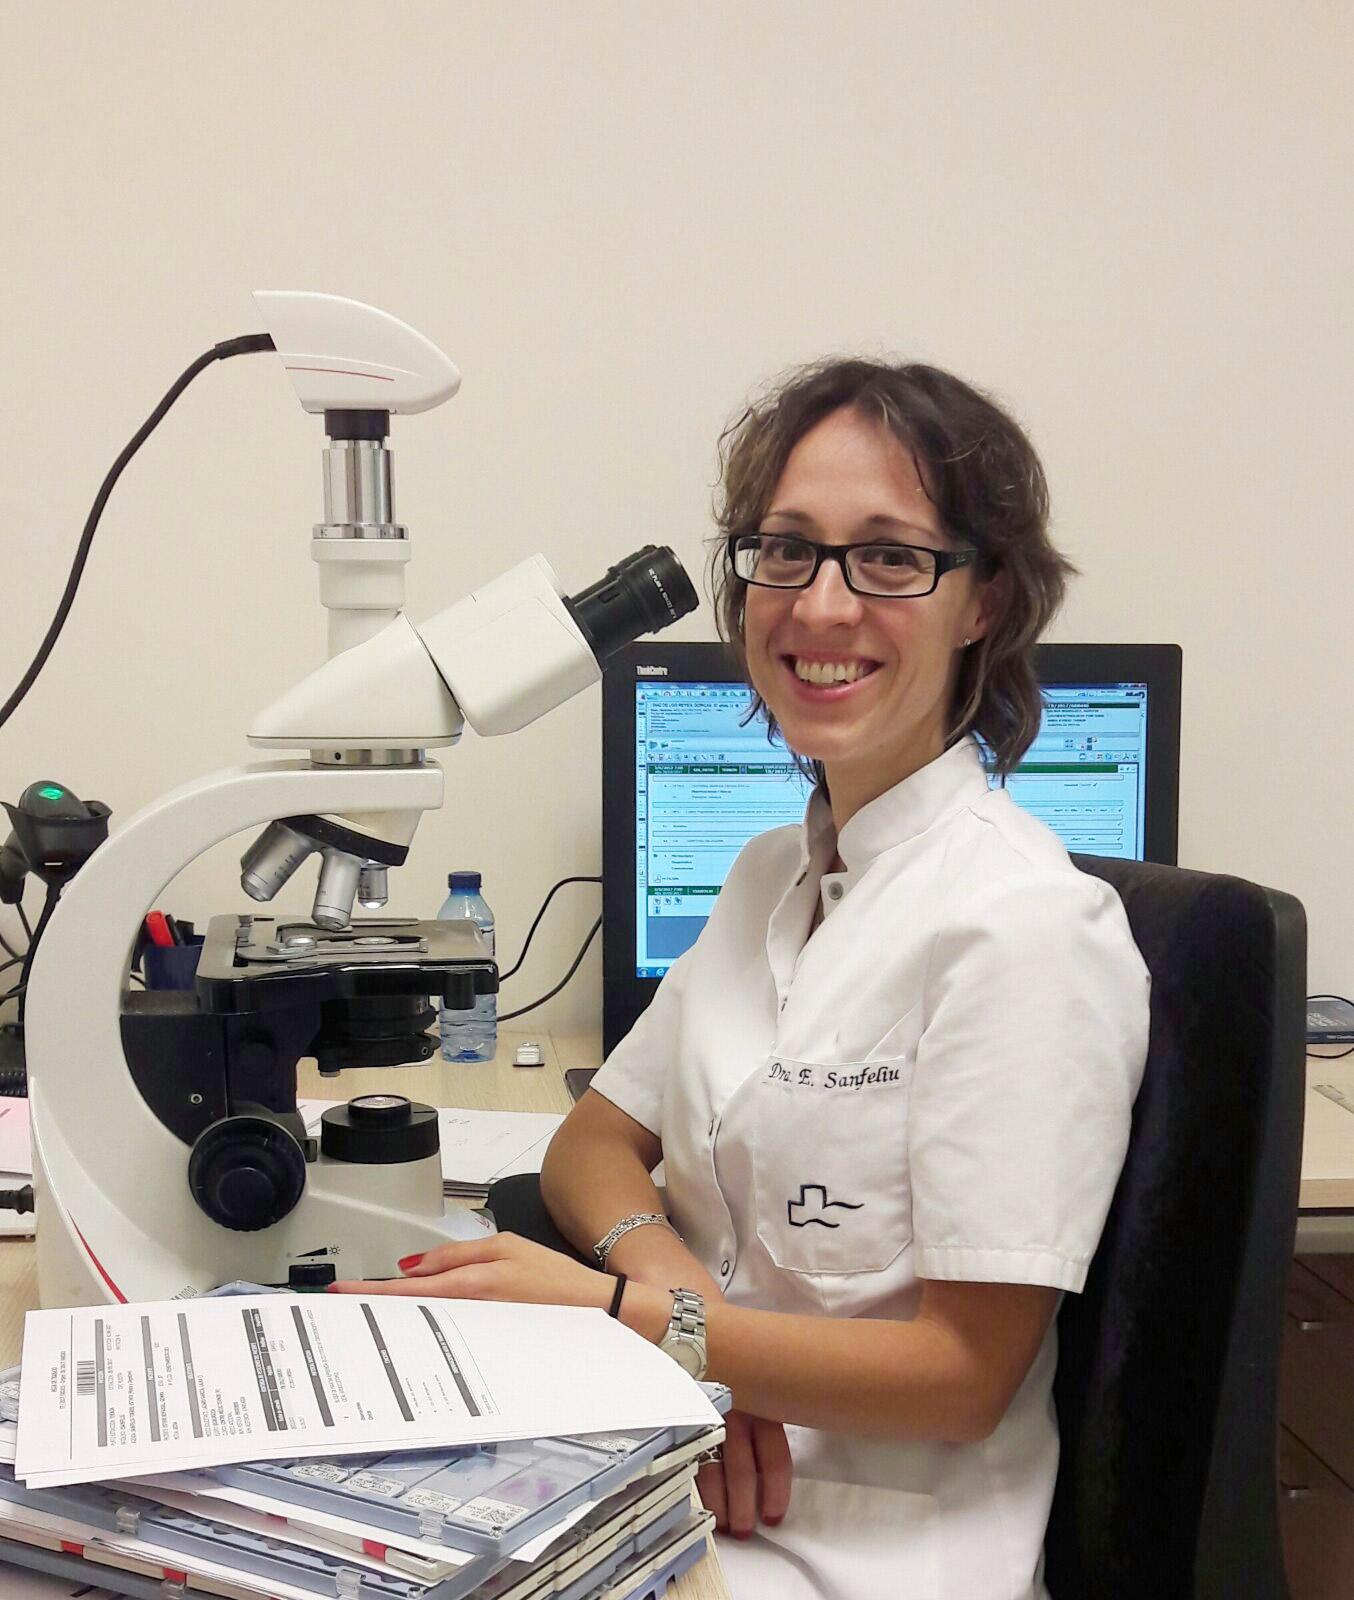 Dra. Esther Sanfeliu Torres - Anatomía patológica